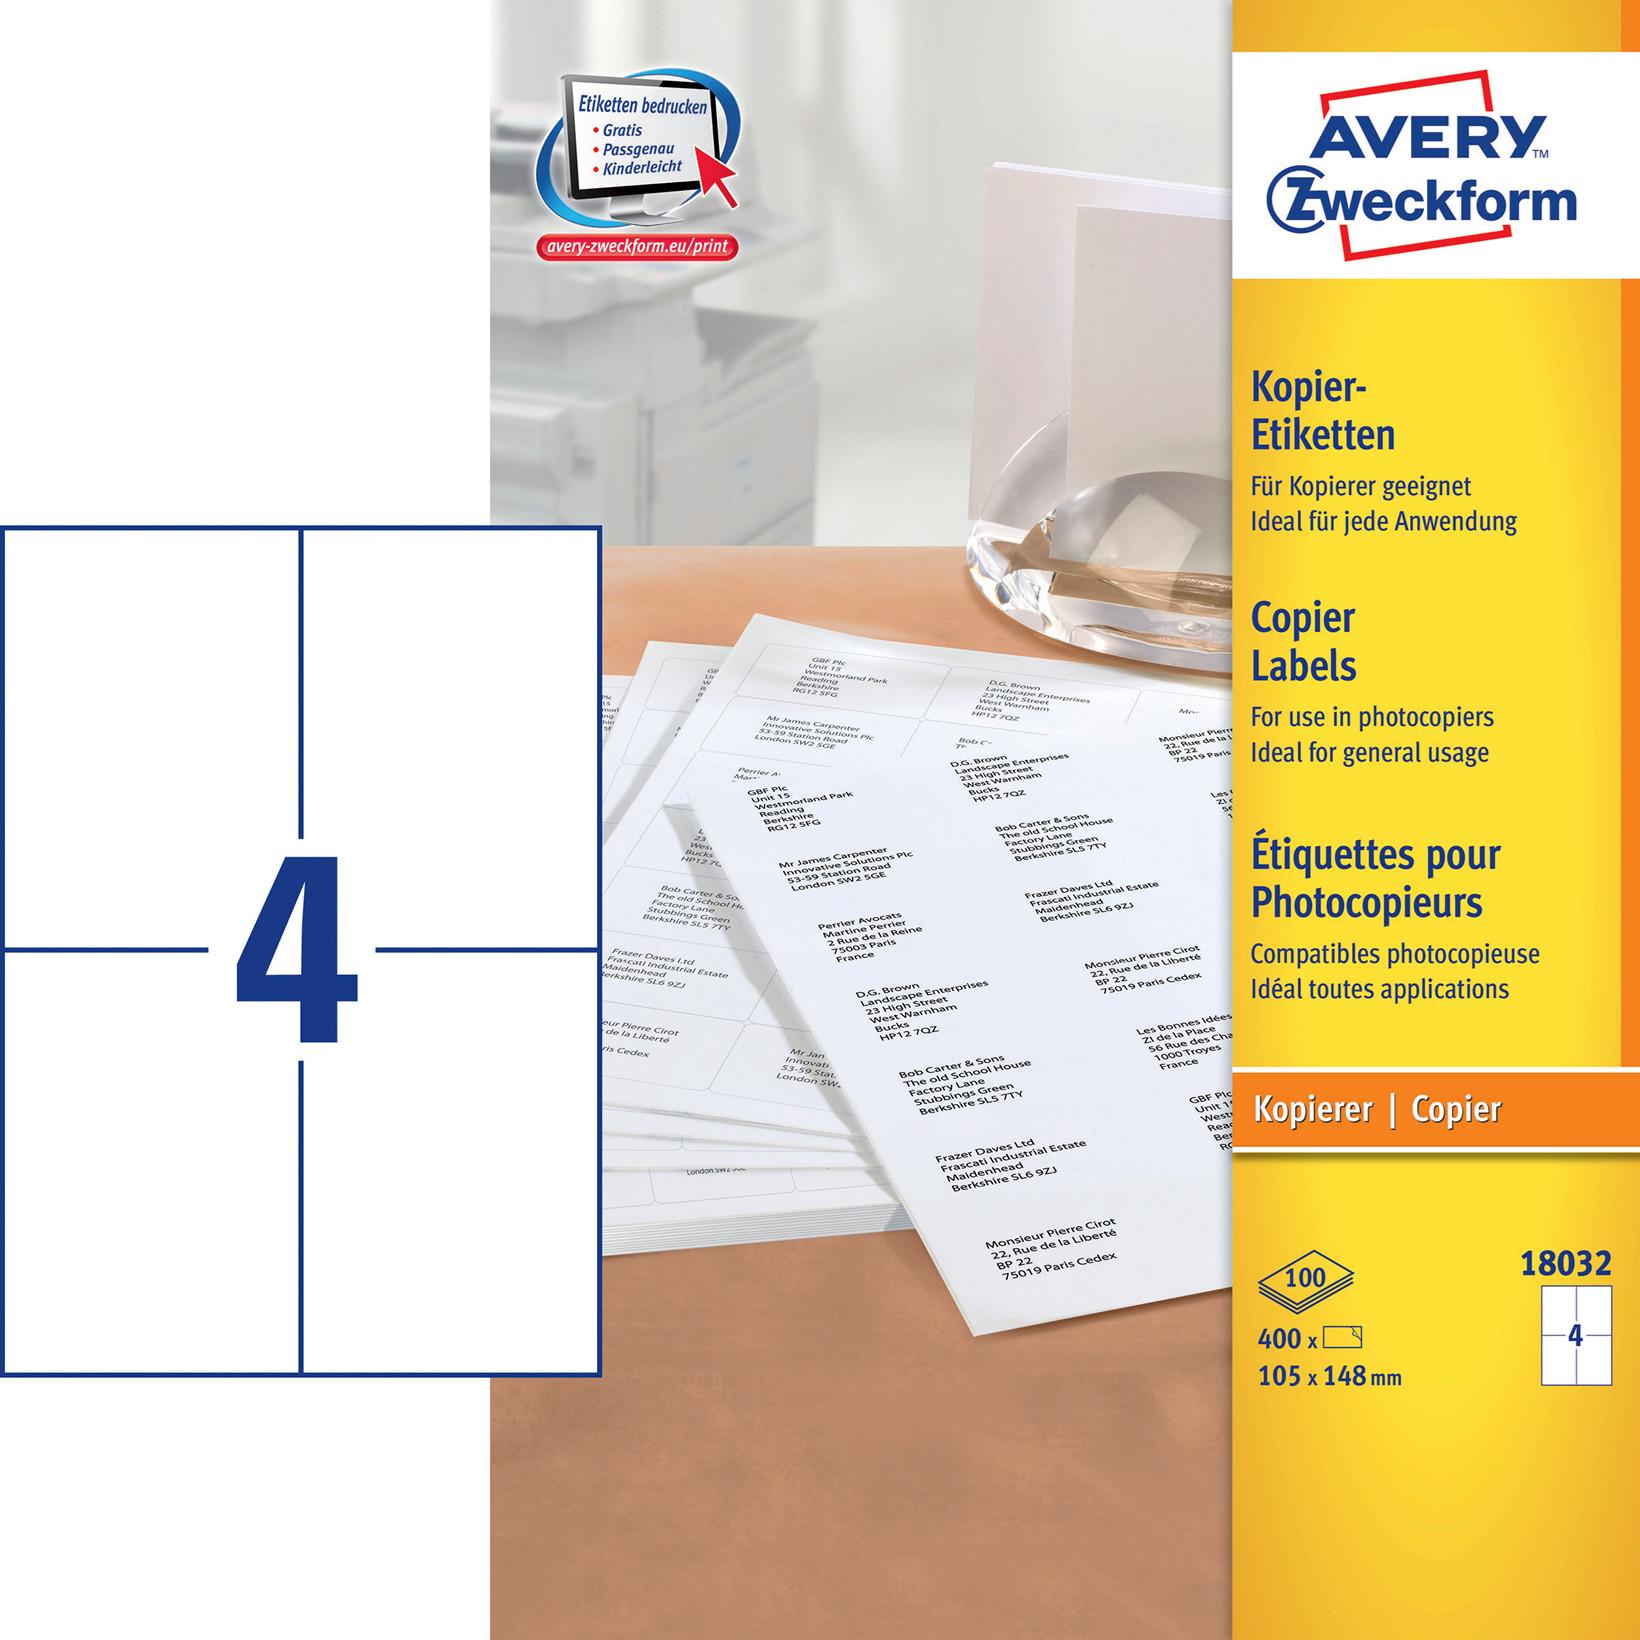 Avery 18032 - Kopietiket 4 pr. ark 105 x 148 mm - 100 ark